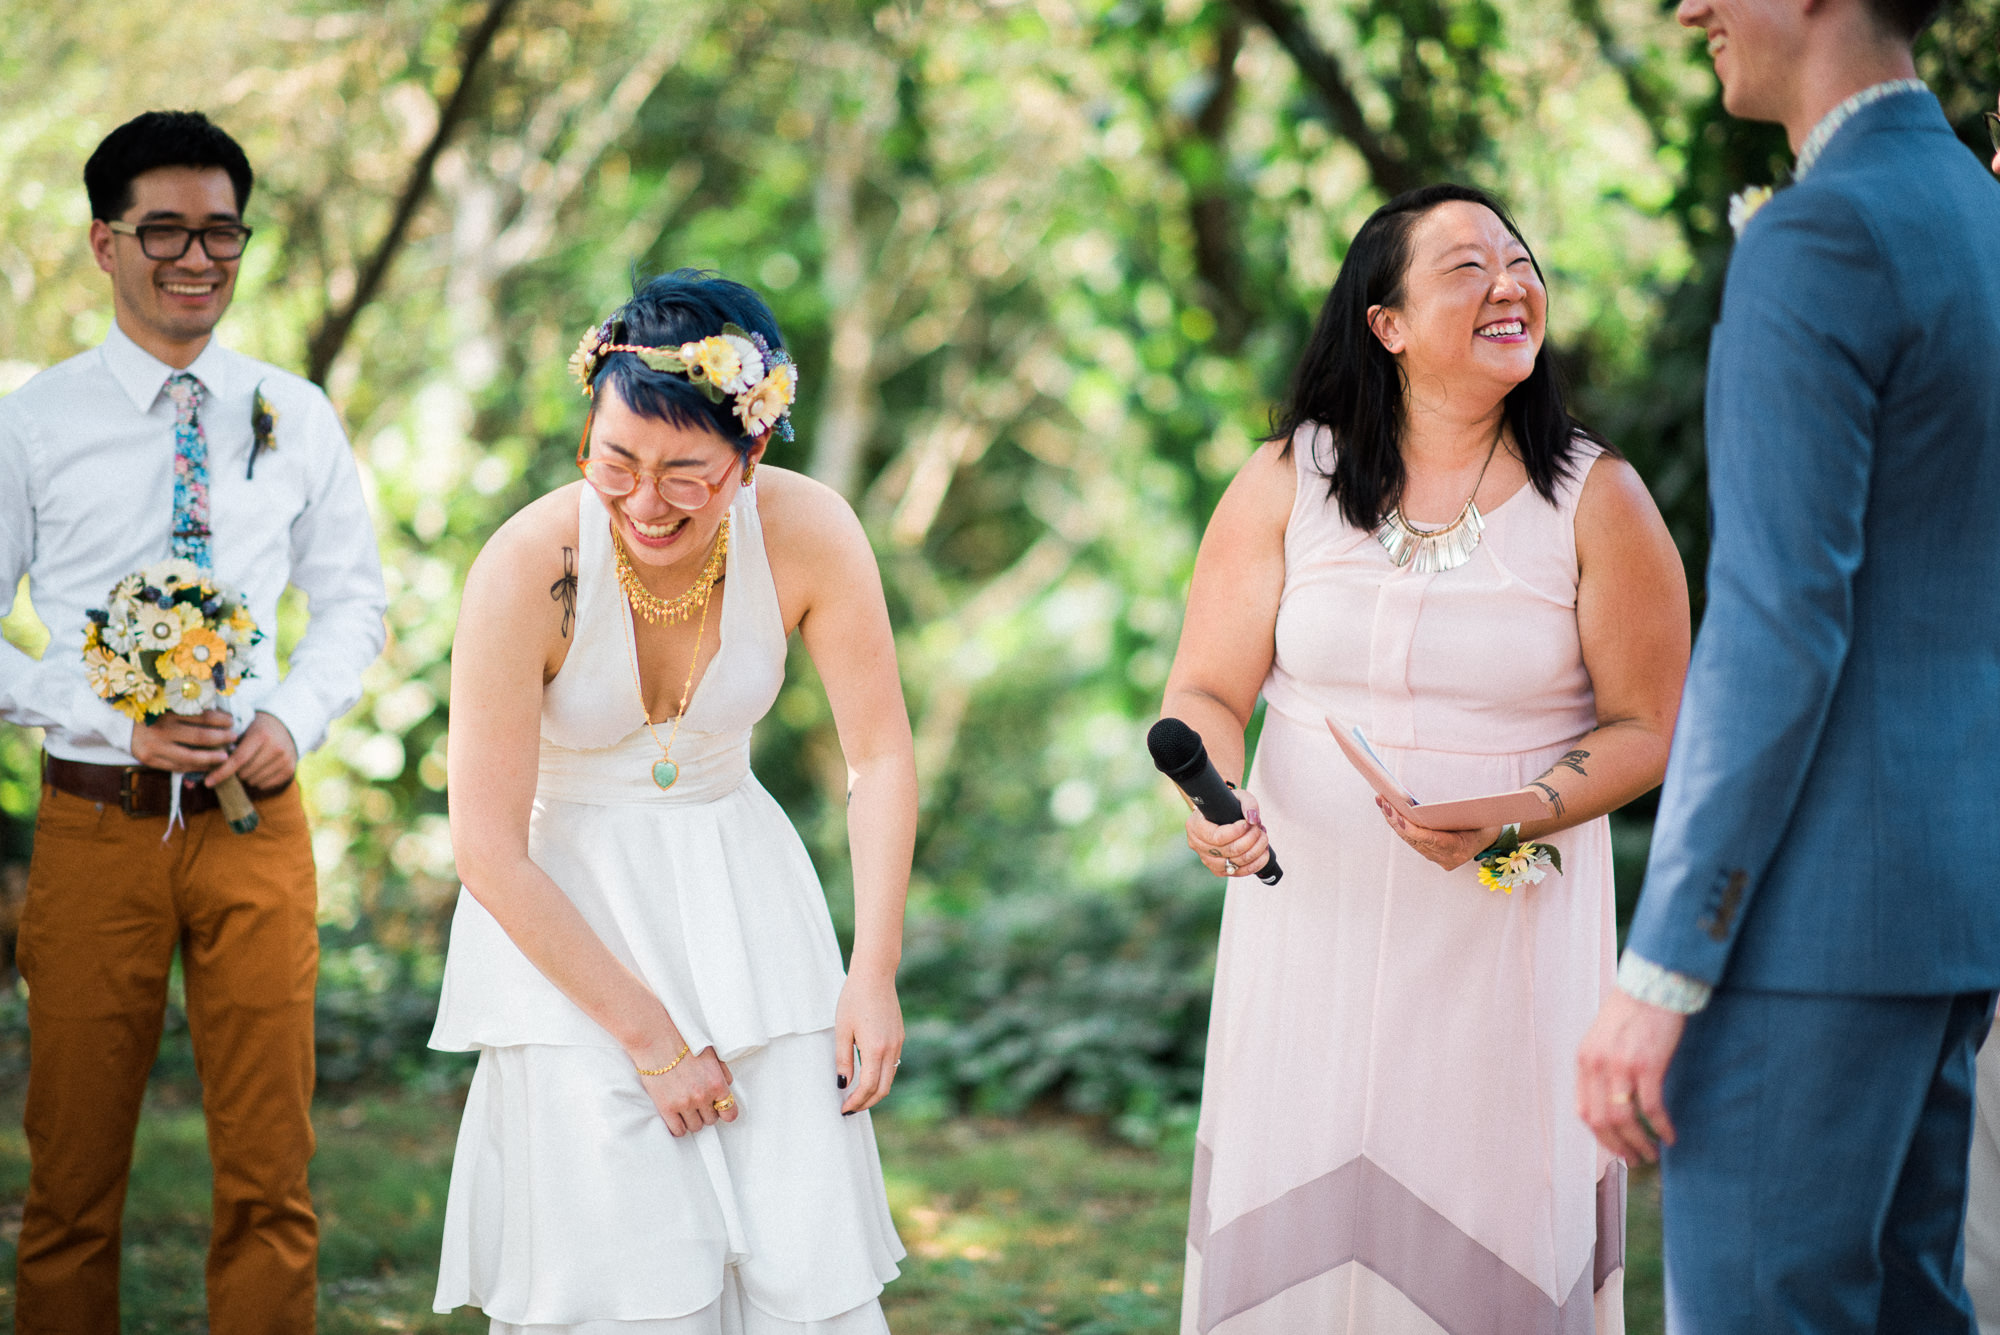 Monte Rio Community Center Wedding 037.jpg